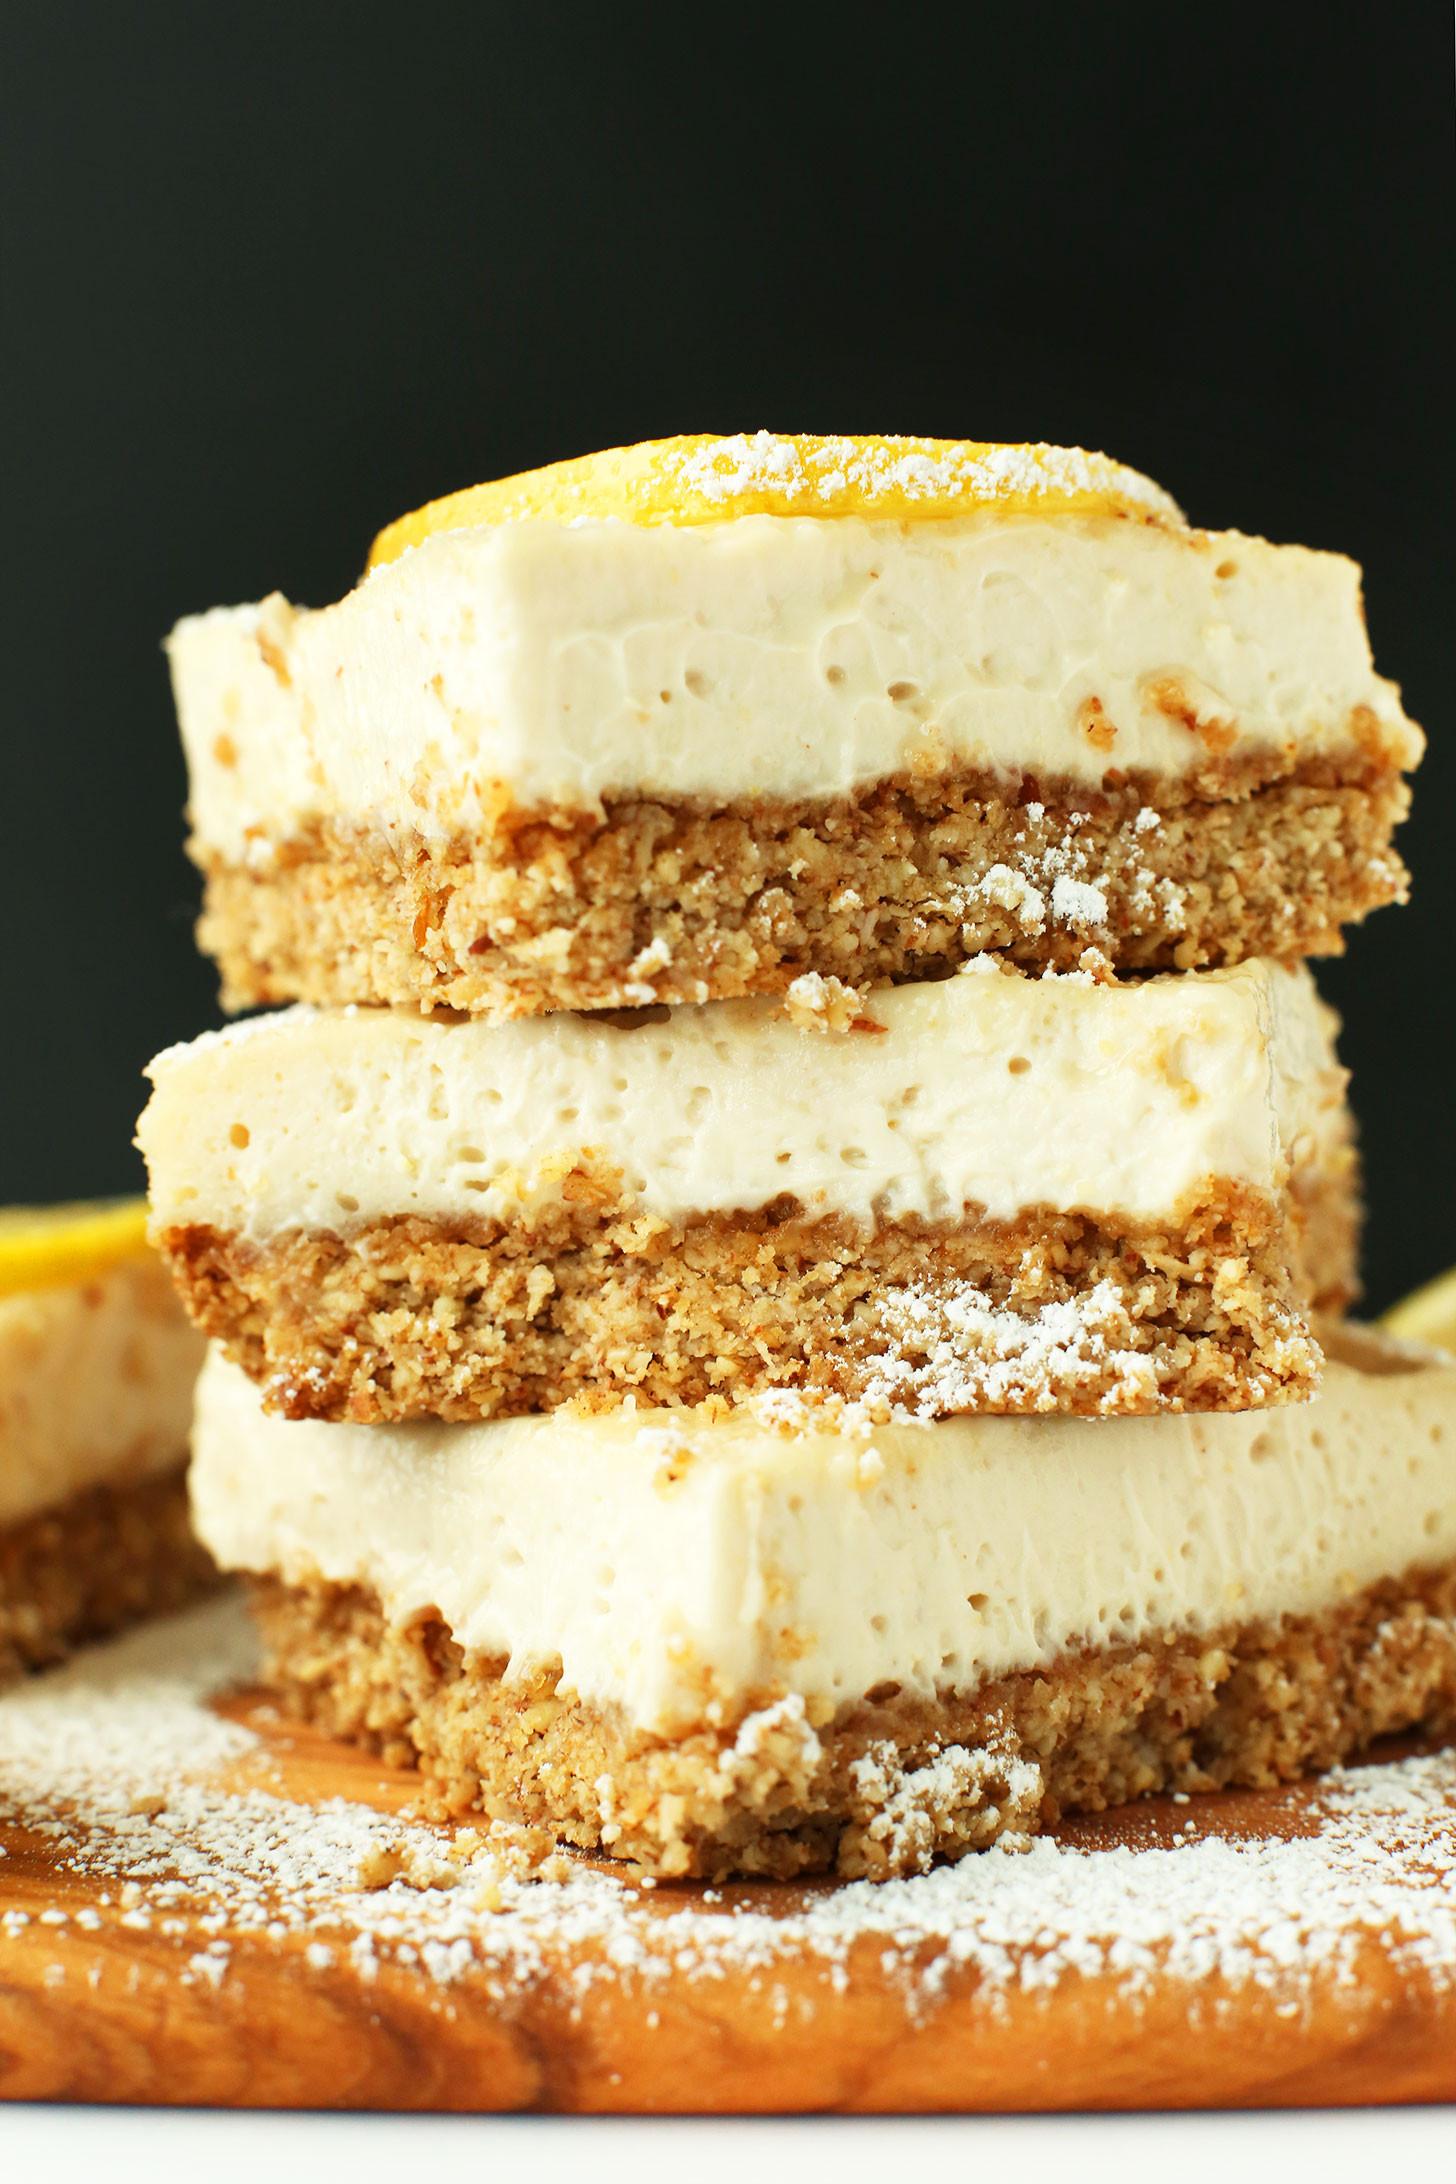 Healthy Lemon Dessert Recipes  Creamy Vegan Lemon Bars GF